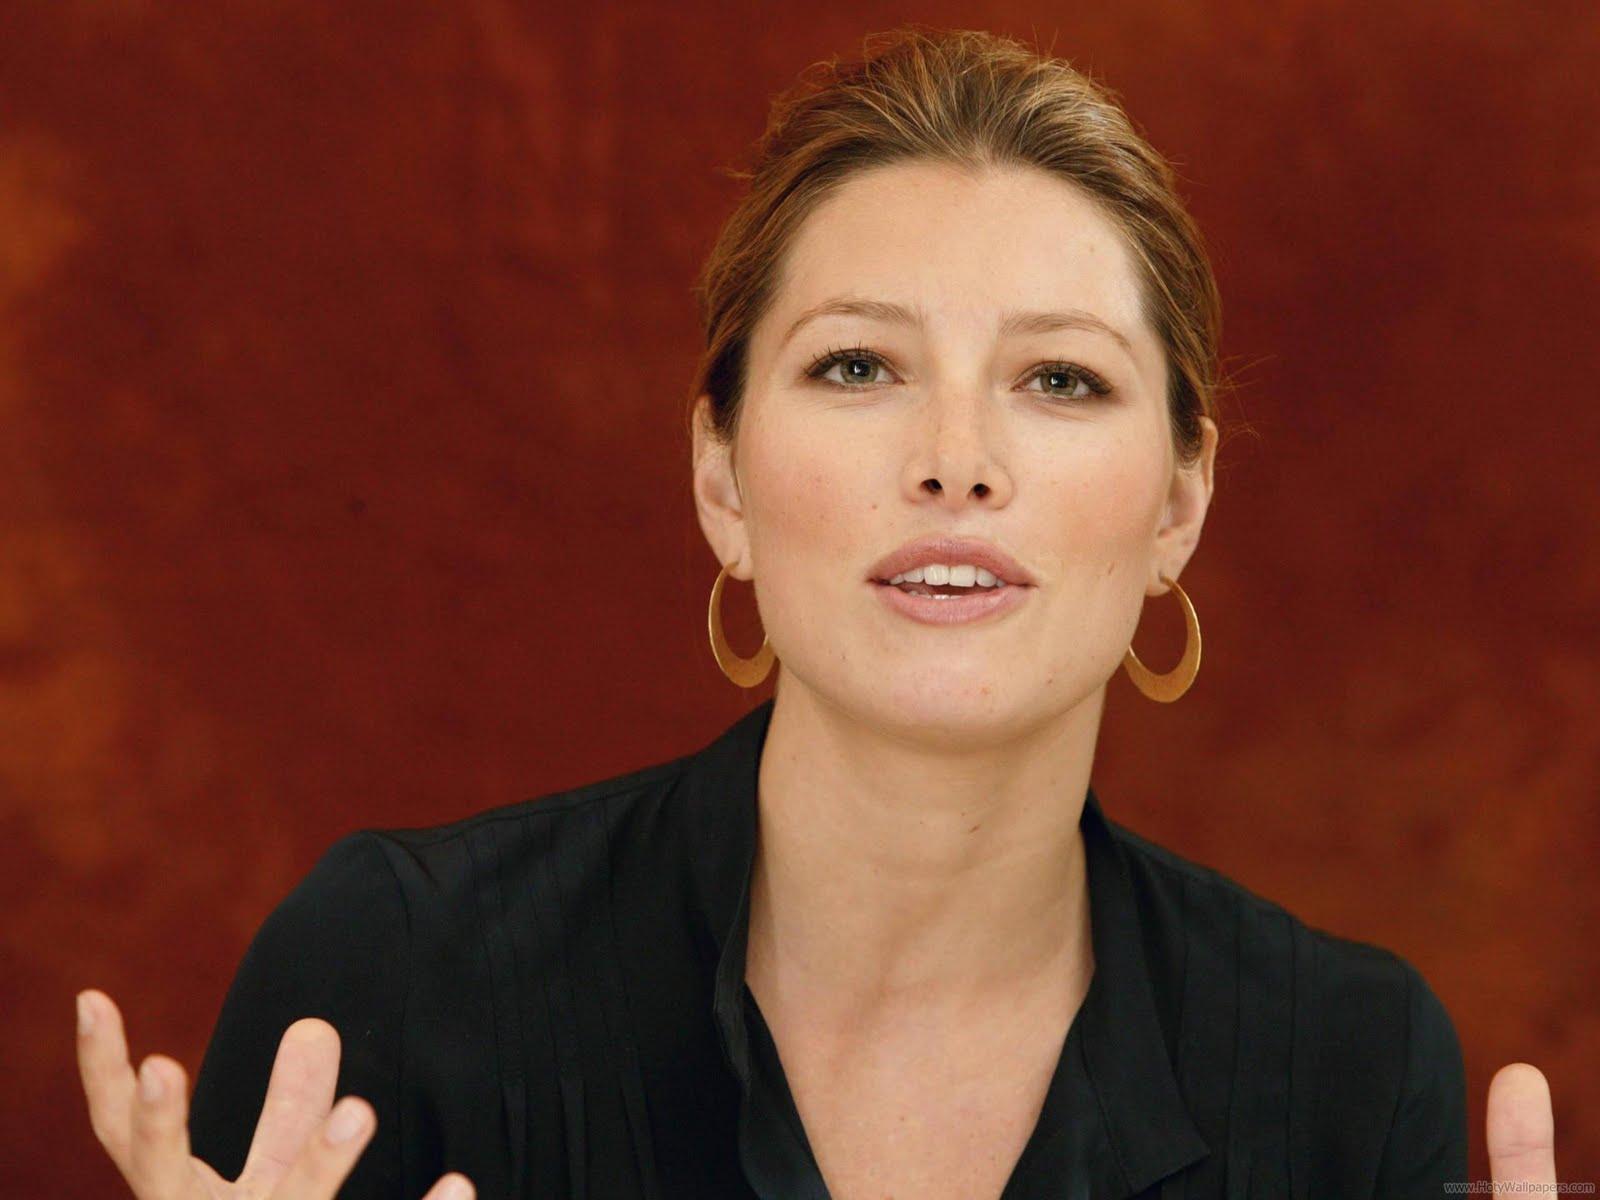 http://2.bp.blogspot.com/-_nIDIdKpGzI/TracAqnLm5I/AAAAAAAAPfg/HLlgGC6fuhQ/s1600/jessica_biel_actress_latest_wallpaper-08-1600x1200.jpg